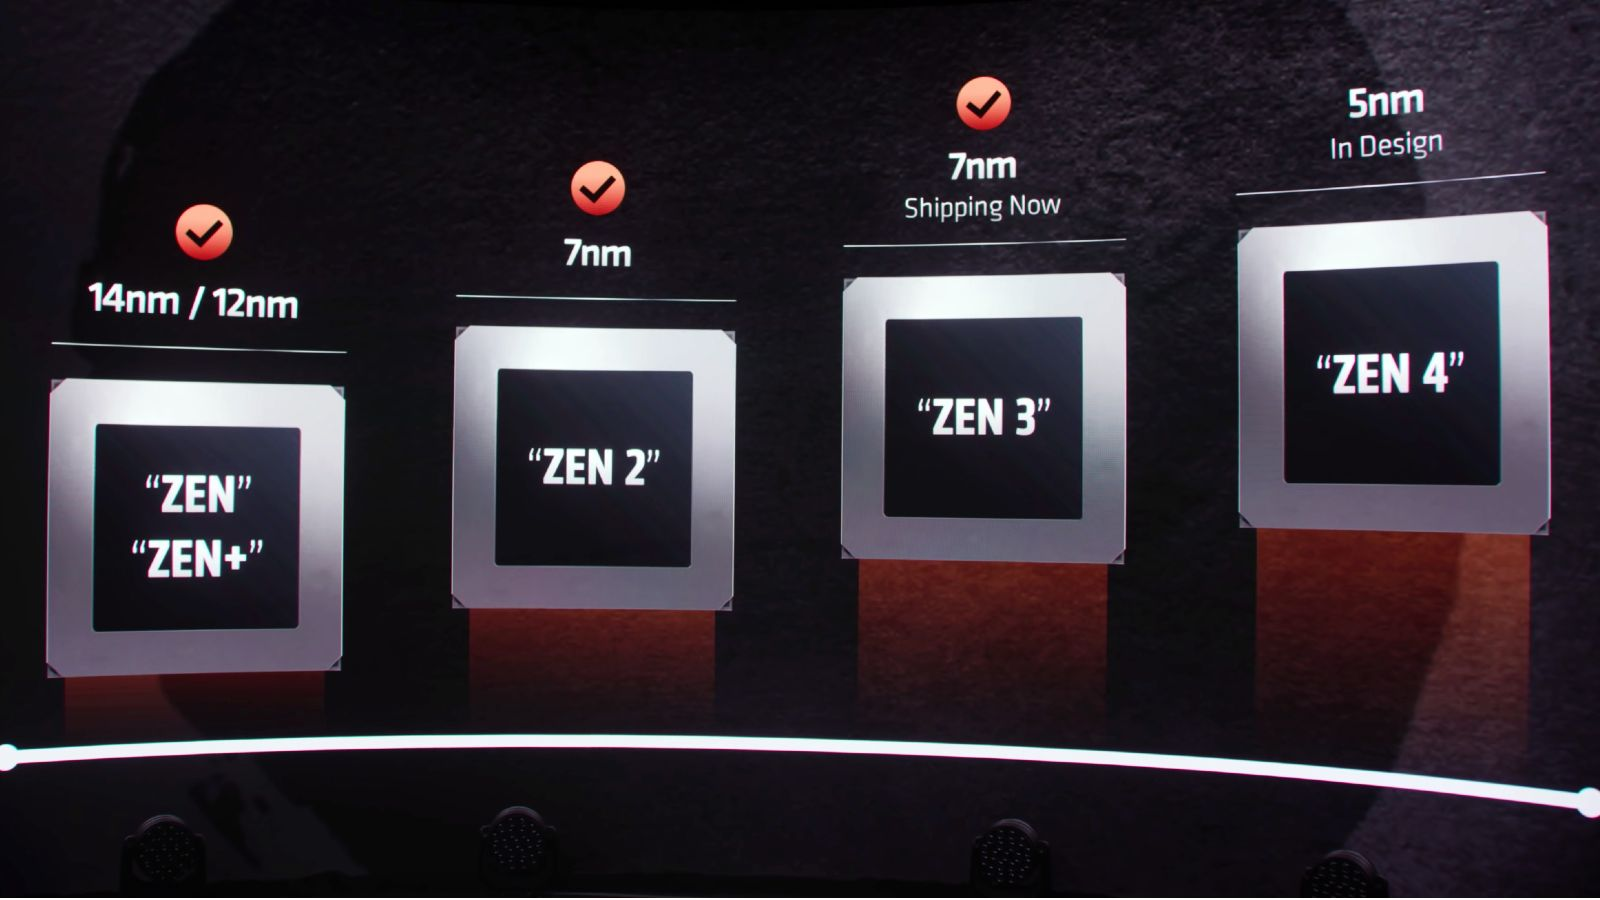 AMD Zen 4 – Tanggal Rilis, Kemampuan, Perangkat Keras, Spesifikasi [aktualizacja 29.07.2021] – dunia komputer